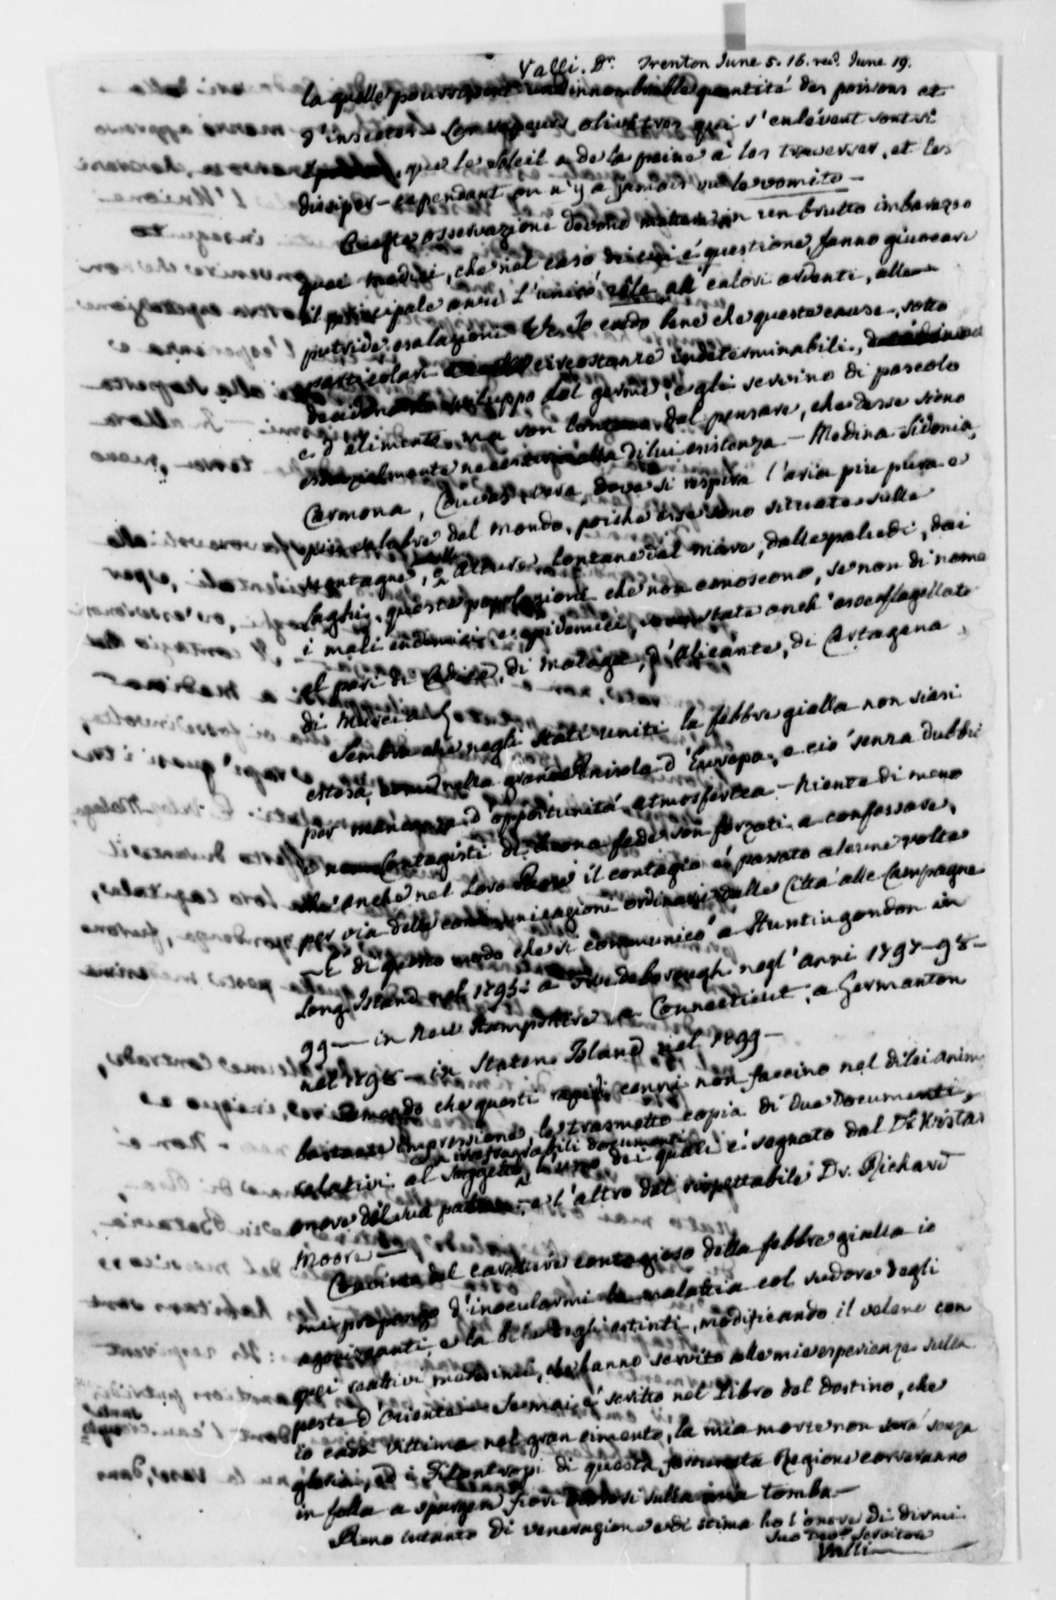 Eusebio Valli to Thomas Jefferson, May 3, 1816, in Italian